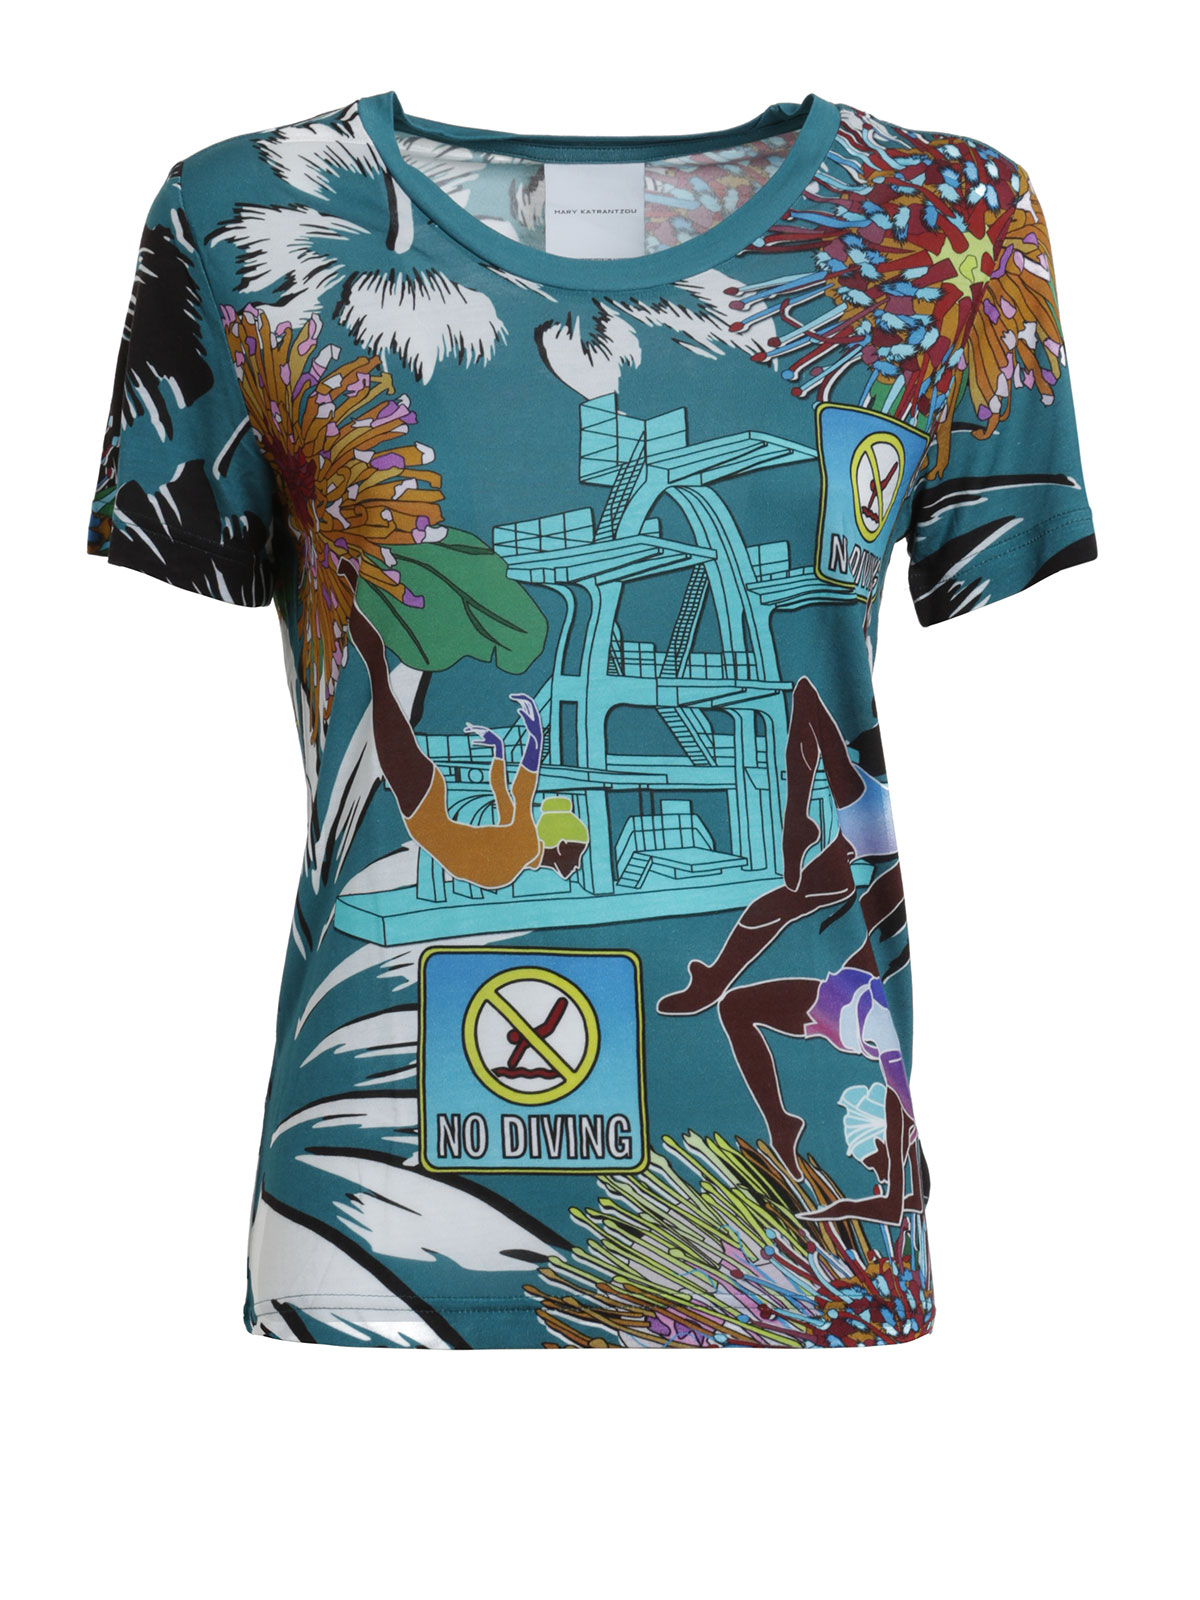 SHIRTS - Shirts Mary Katrantzou 100% Guaranteed Cheap Online Very Cheap Online C4bcq1To